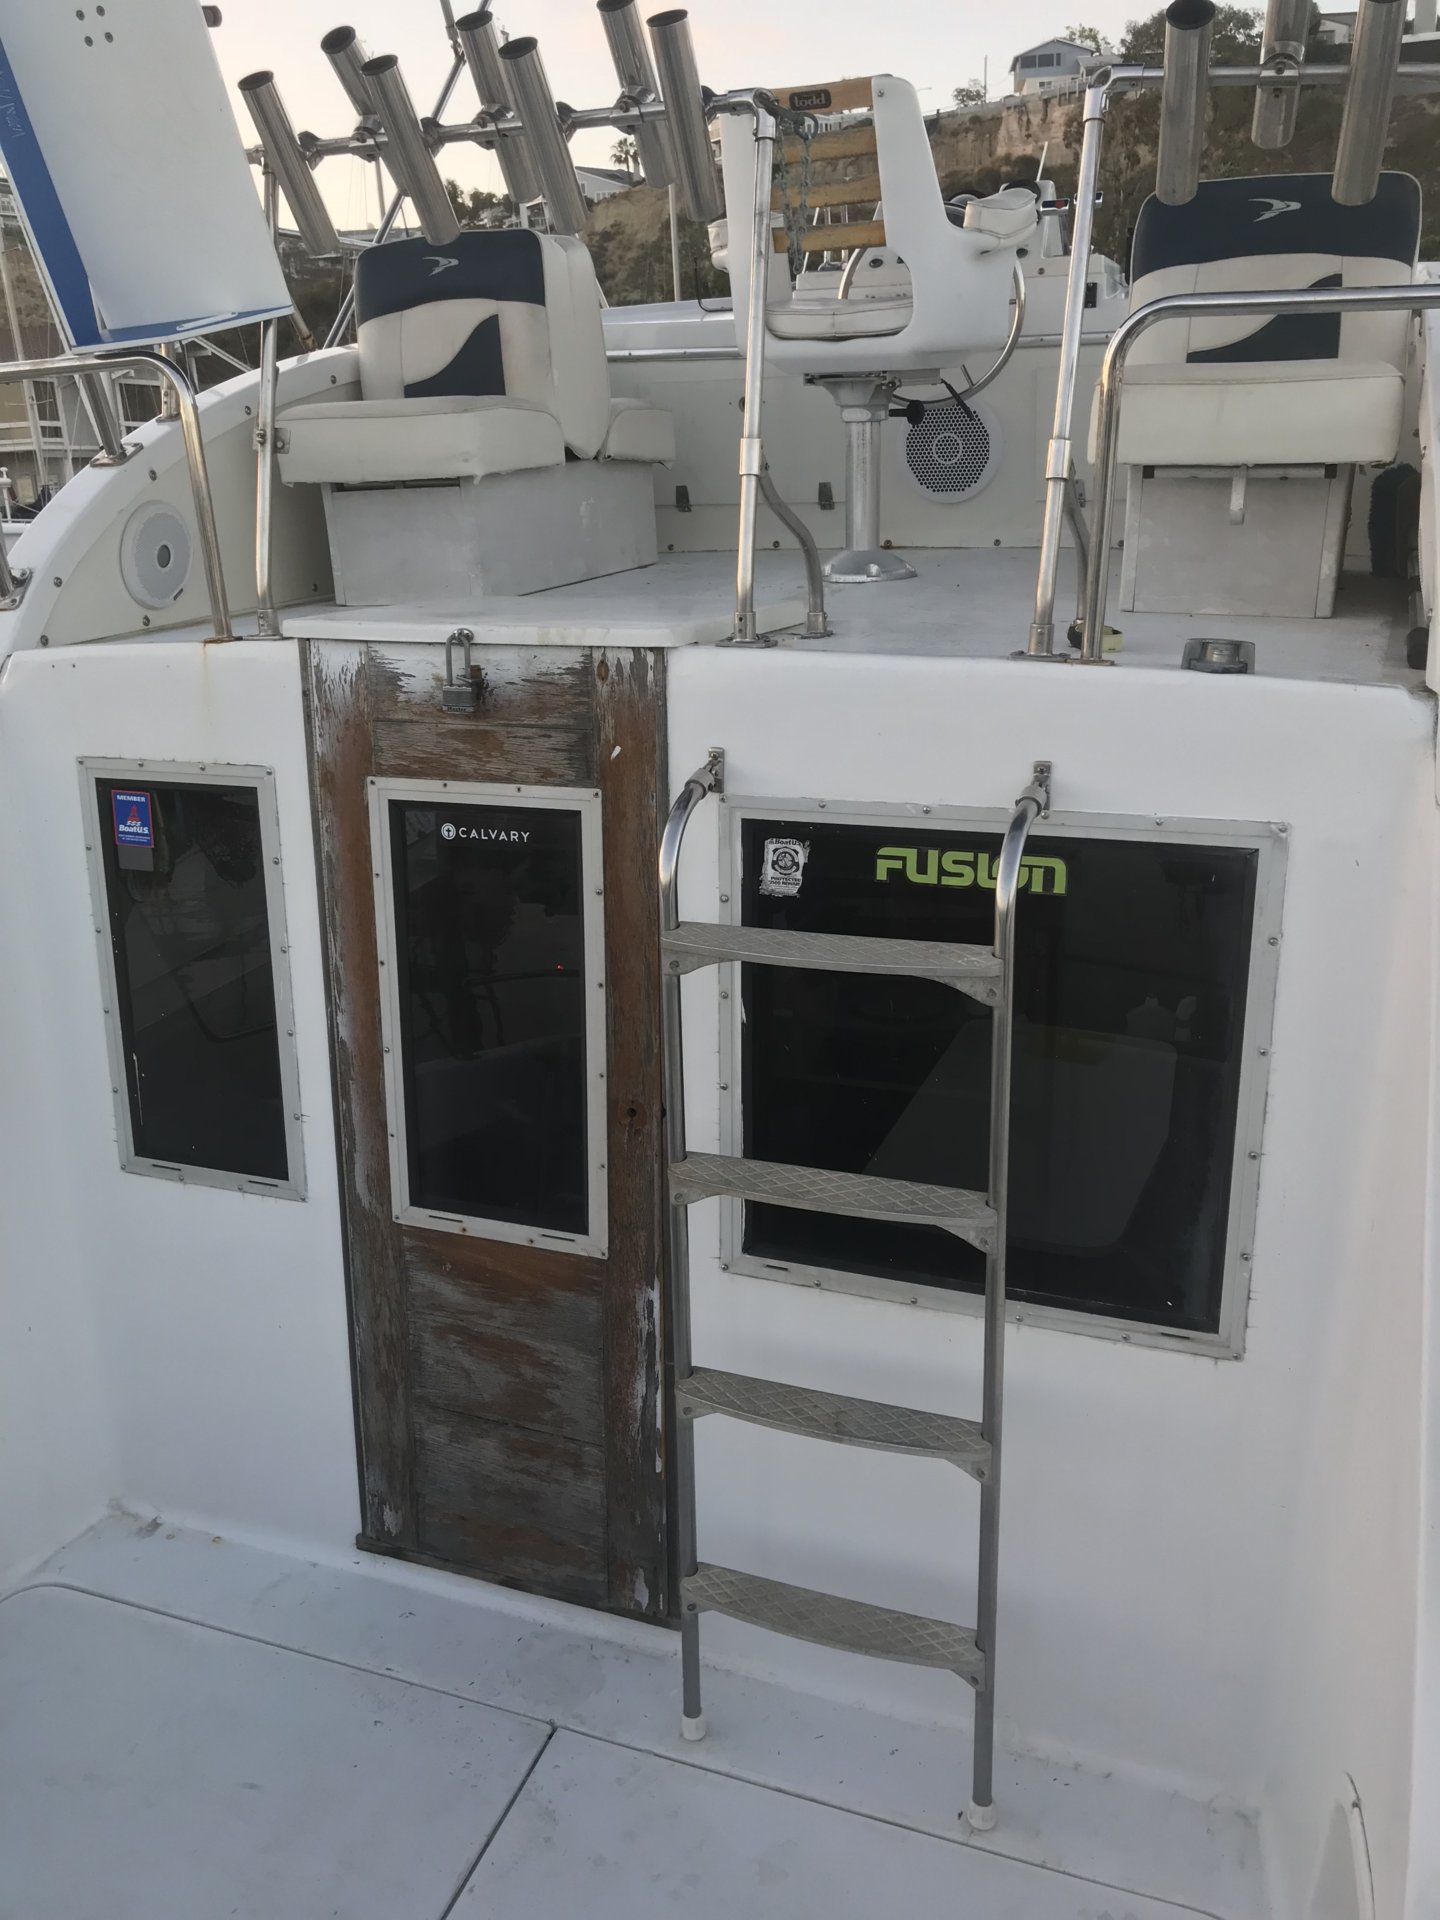 FE6745A4-46FF-4B77-9F7C-E150A4033D67.jpeg